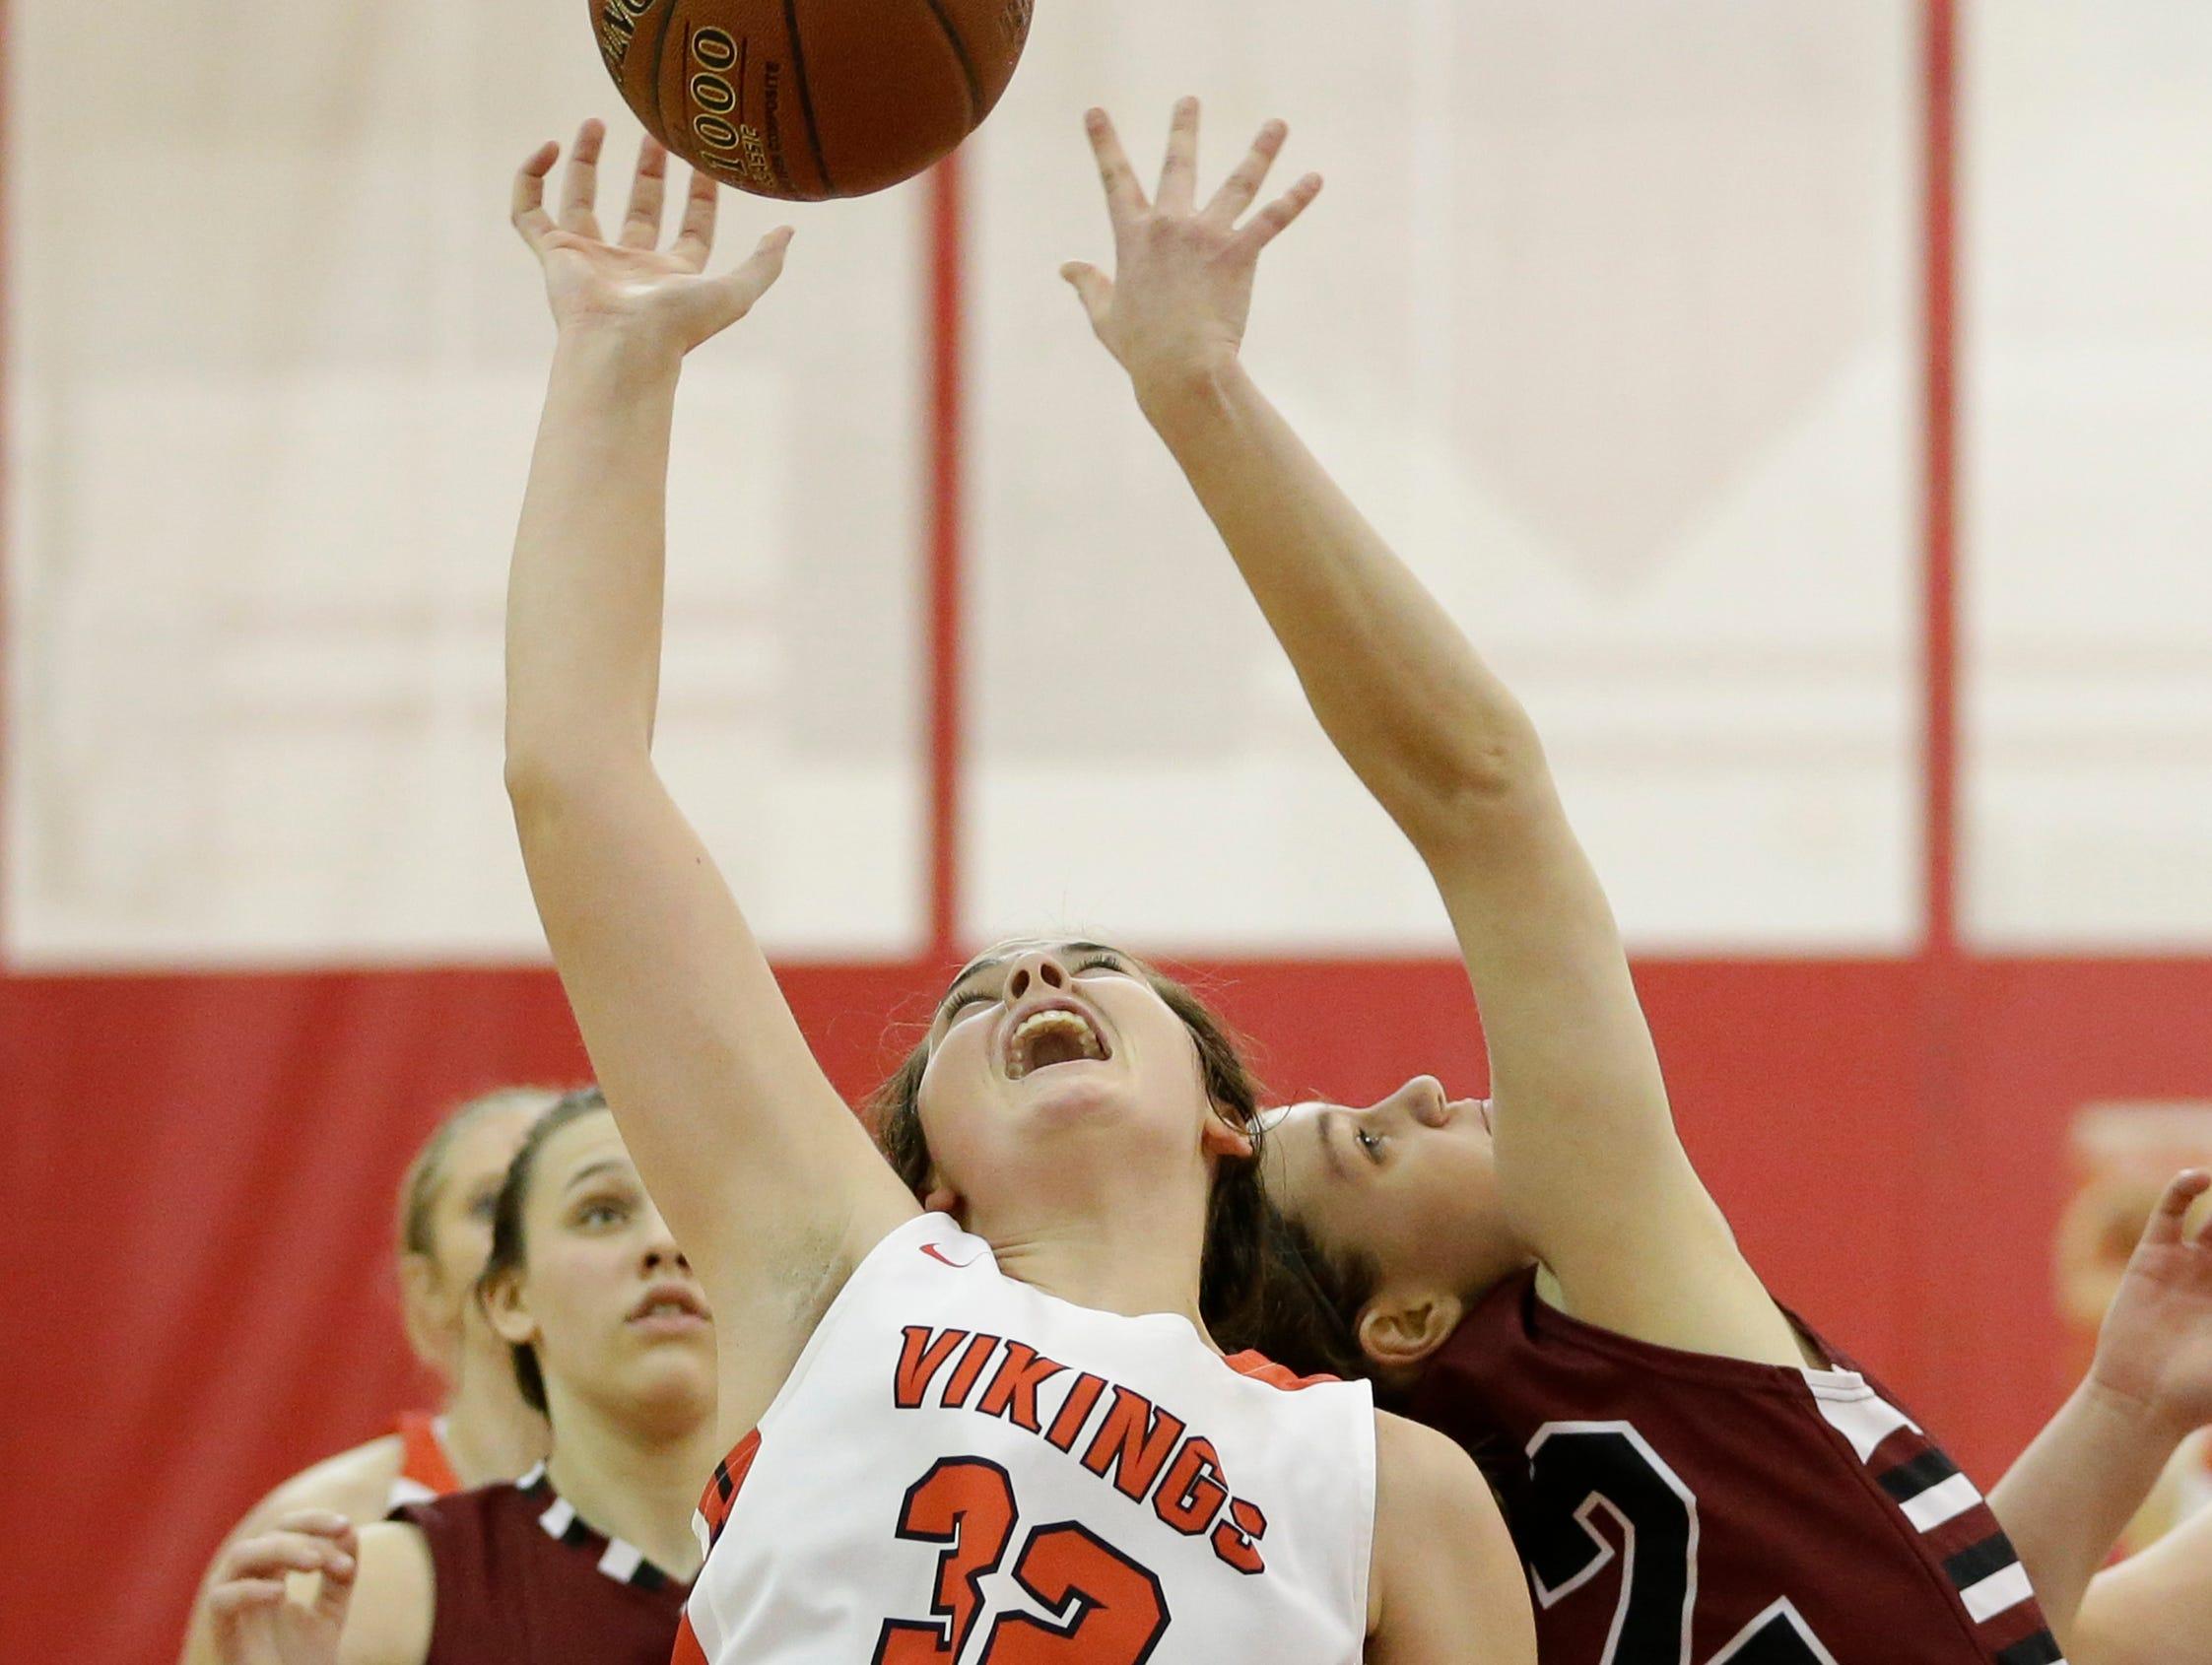 Valders' Lindsay Glaeser (32) reaches for a rebound against New Holstein at Valders High School Friday, February 8, 2019, in Valders, Wis. Joshua Clark/USA TODAY NETWORK-Wisconsin